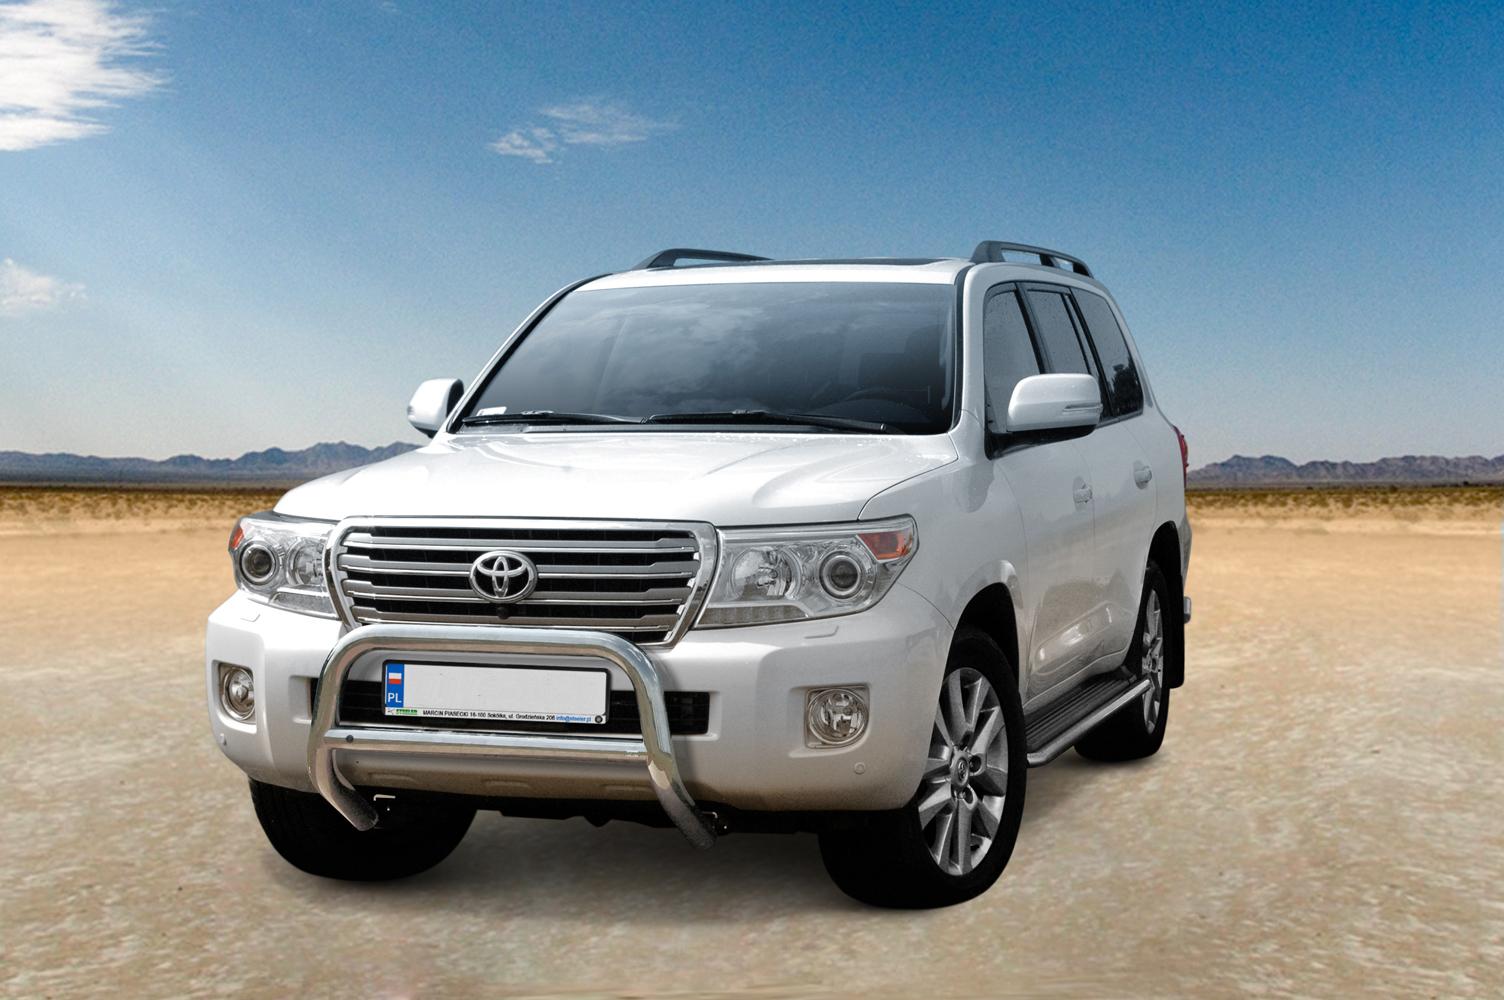 EU-Kufanger Ø 70mm, tverrrør /Ø 60mm, Toyota LAND CRUISER V8, mod. 2012->2016